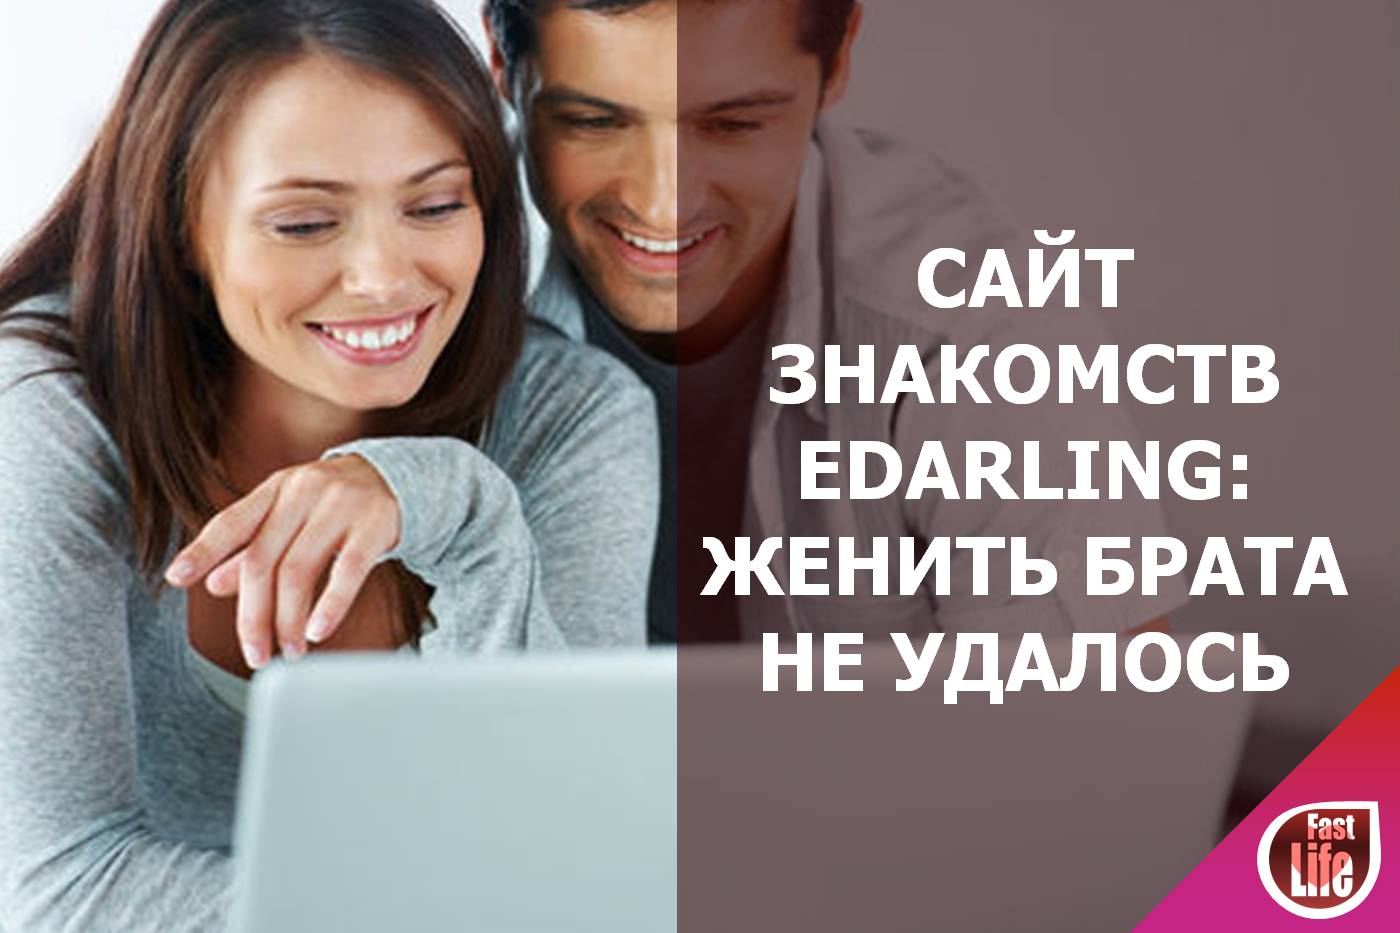 Первое свидание после интернет-знакомства моя страница ru love знакомства phpbb